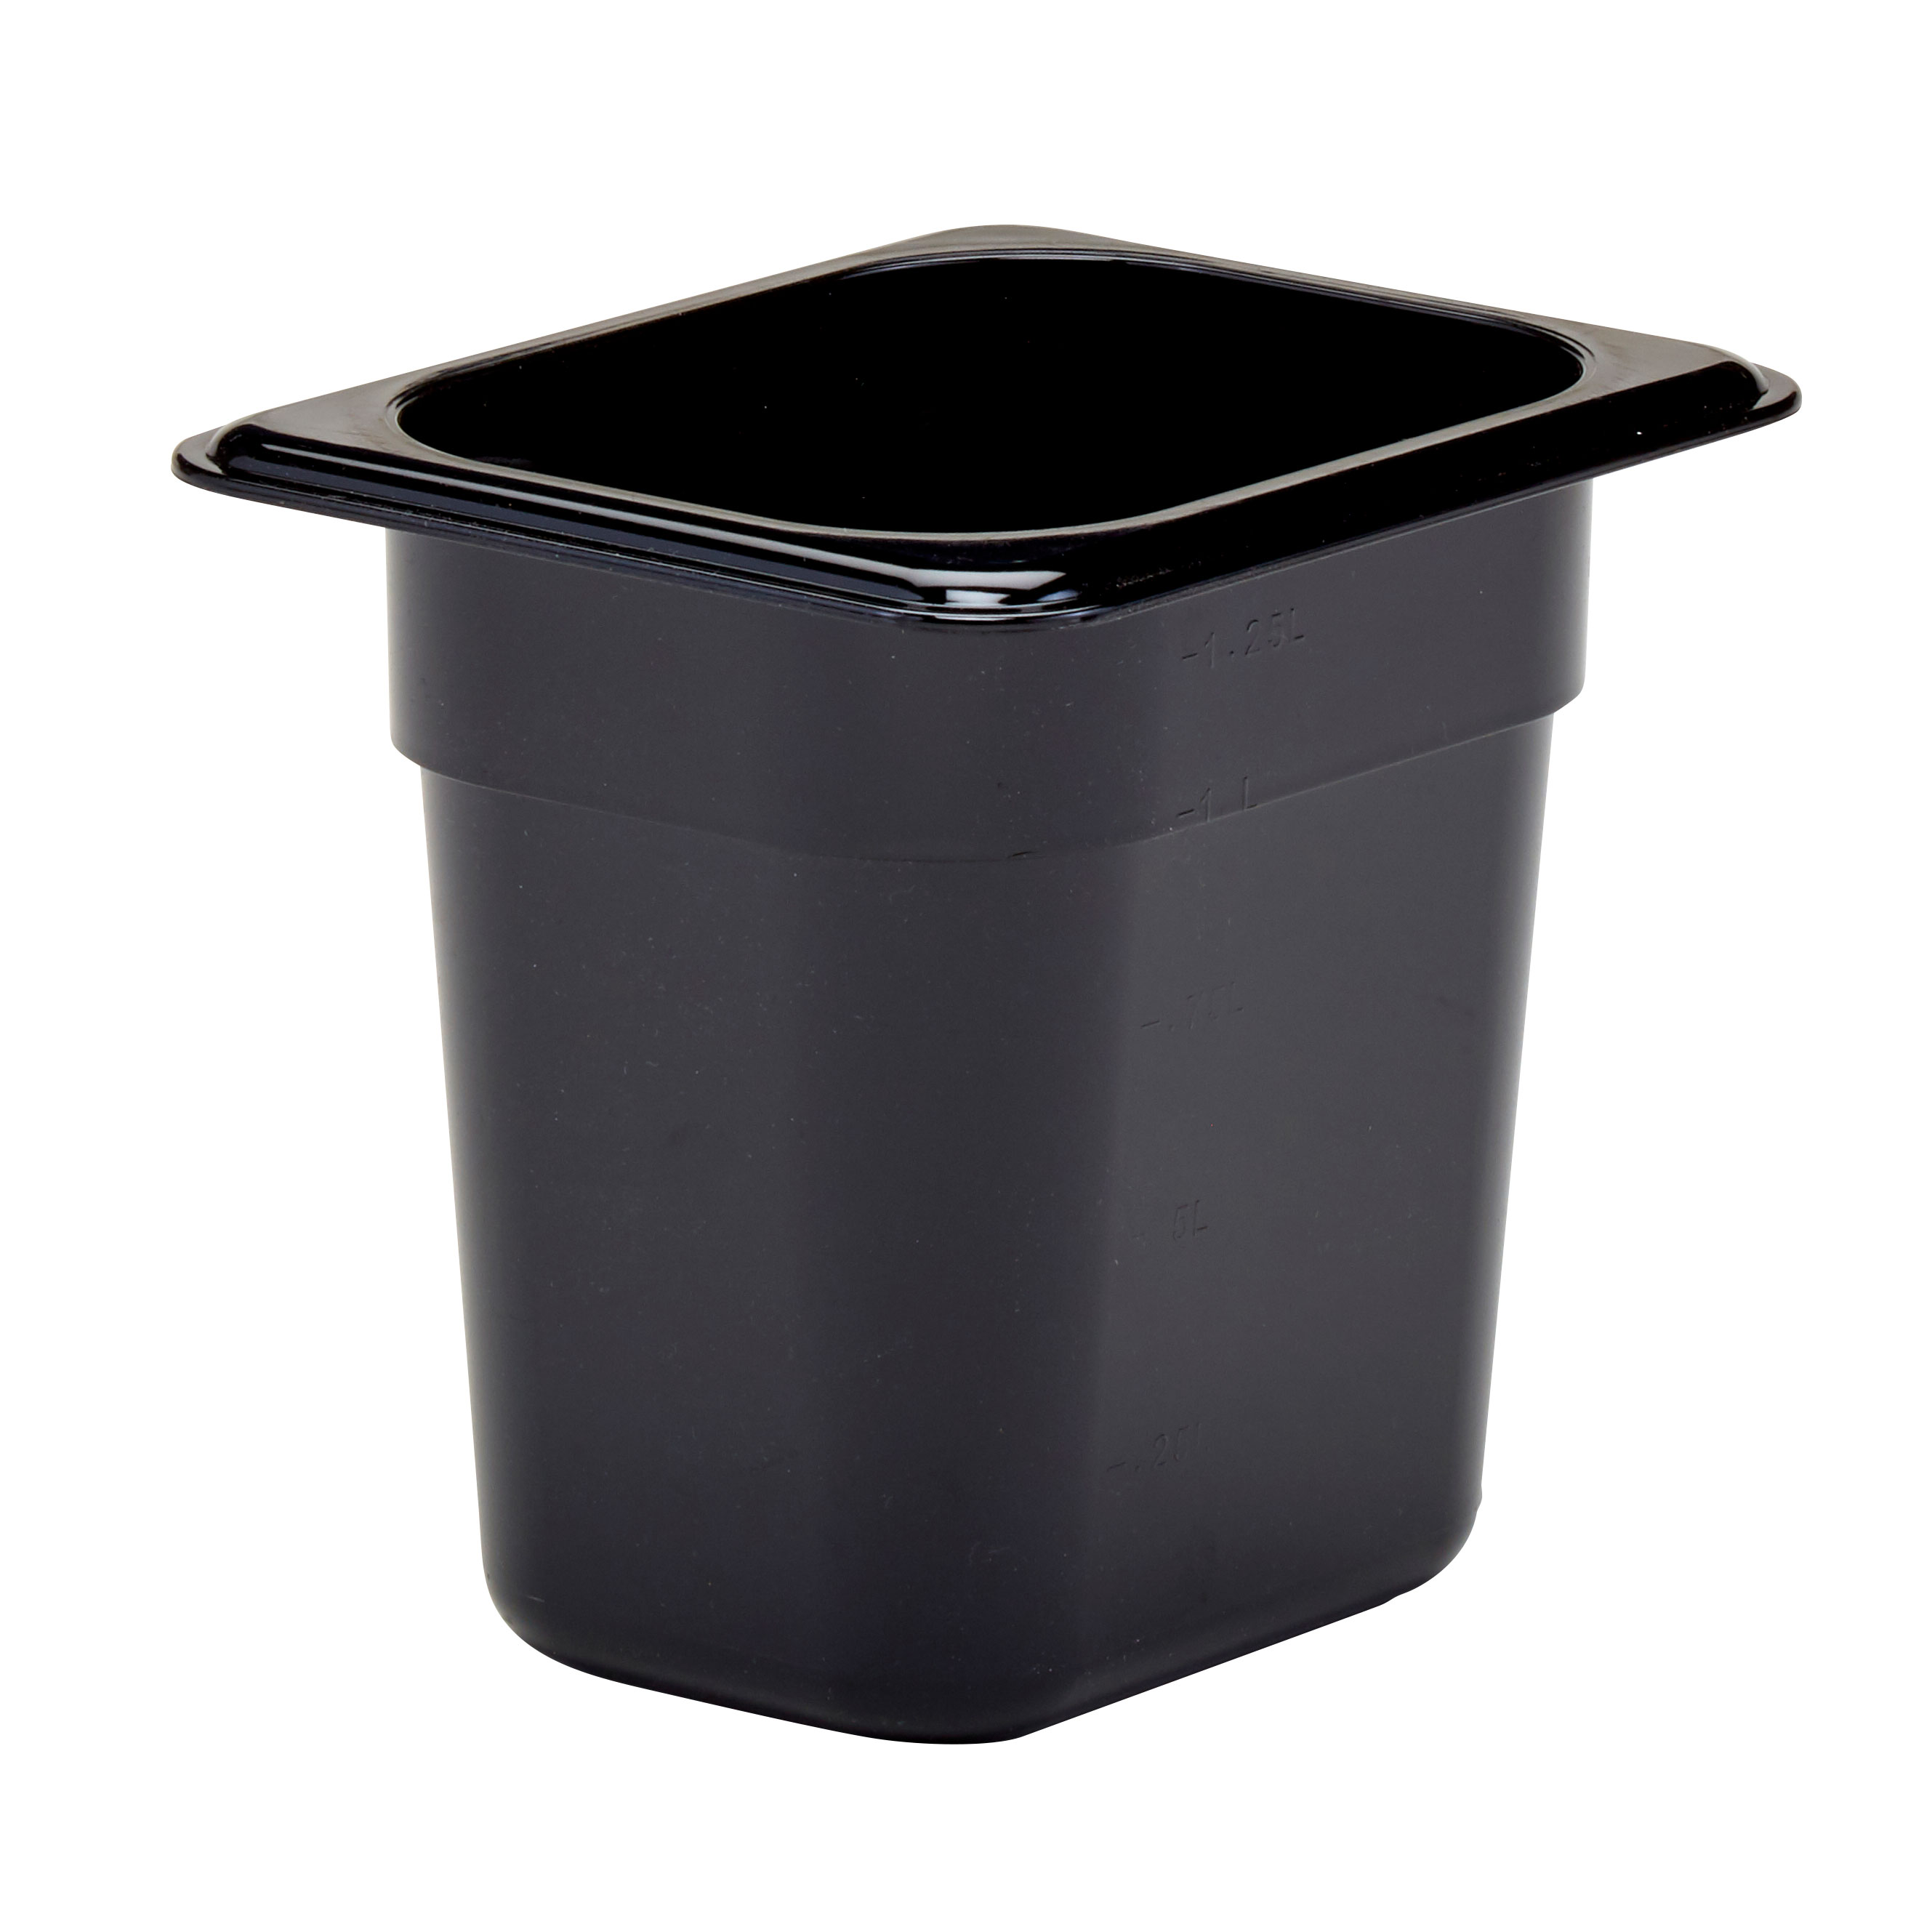 Cambro 86HP110 food pans